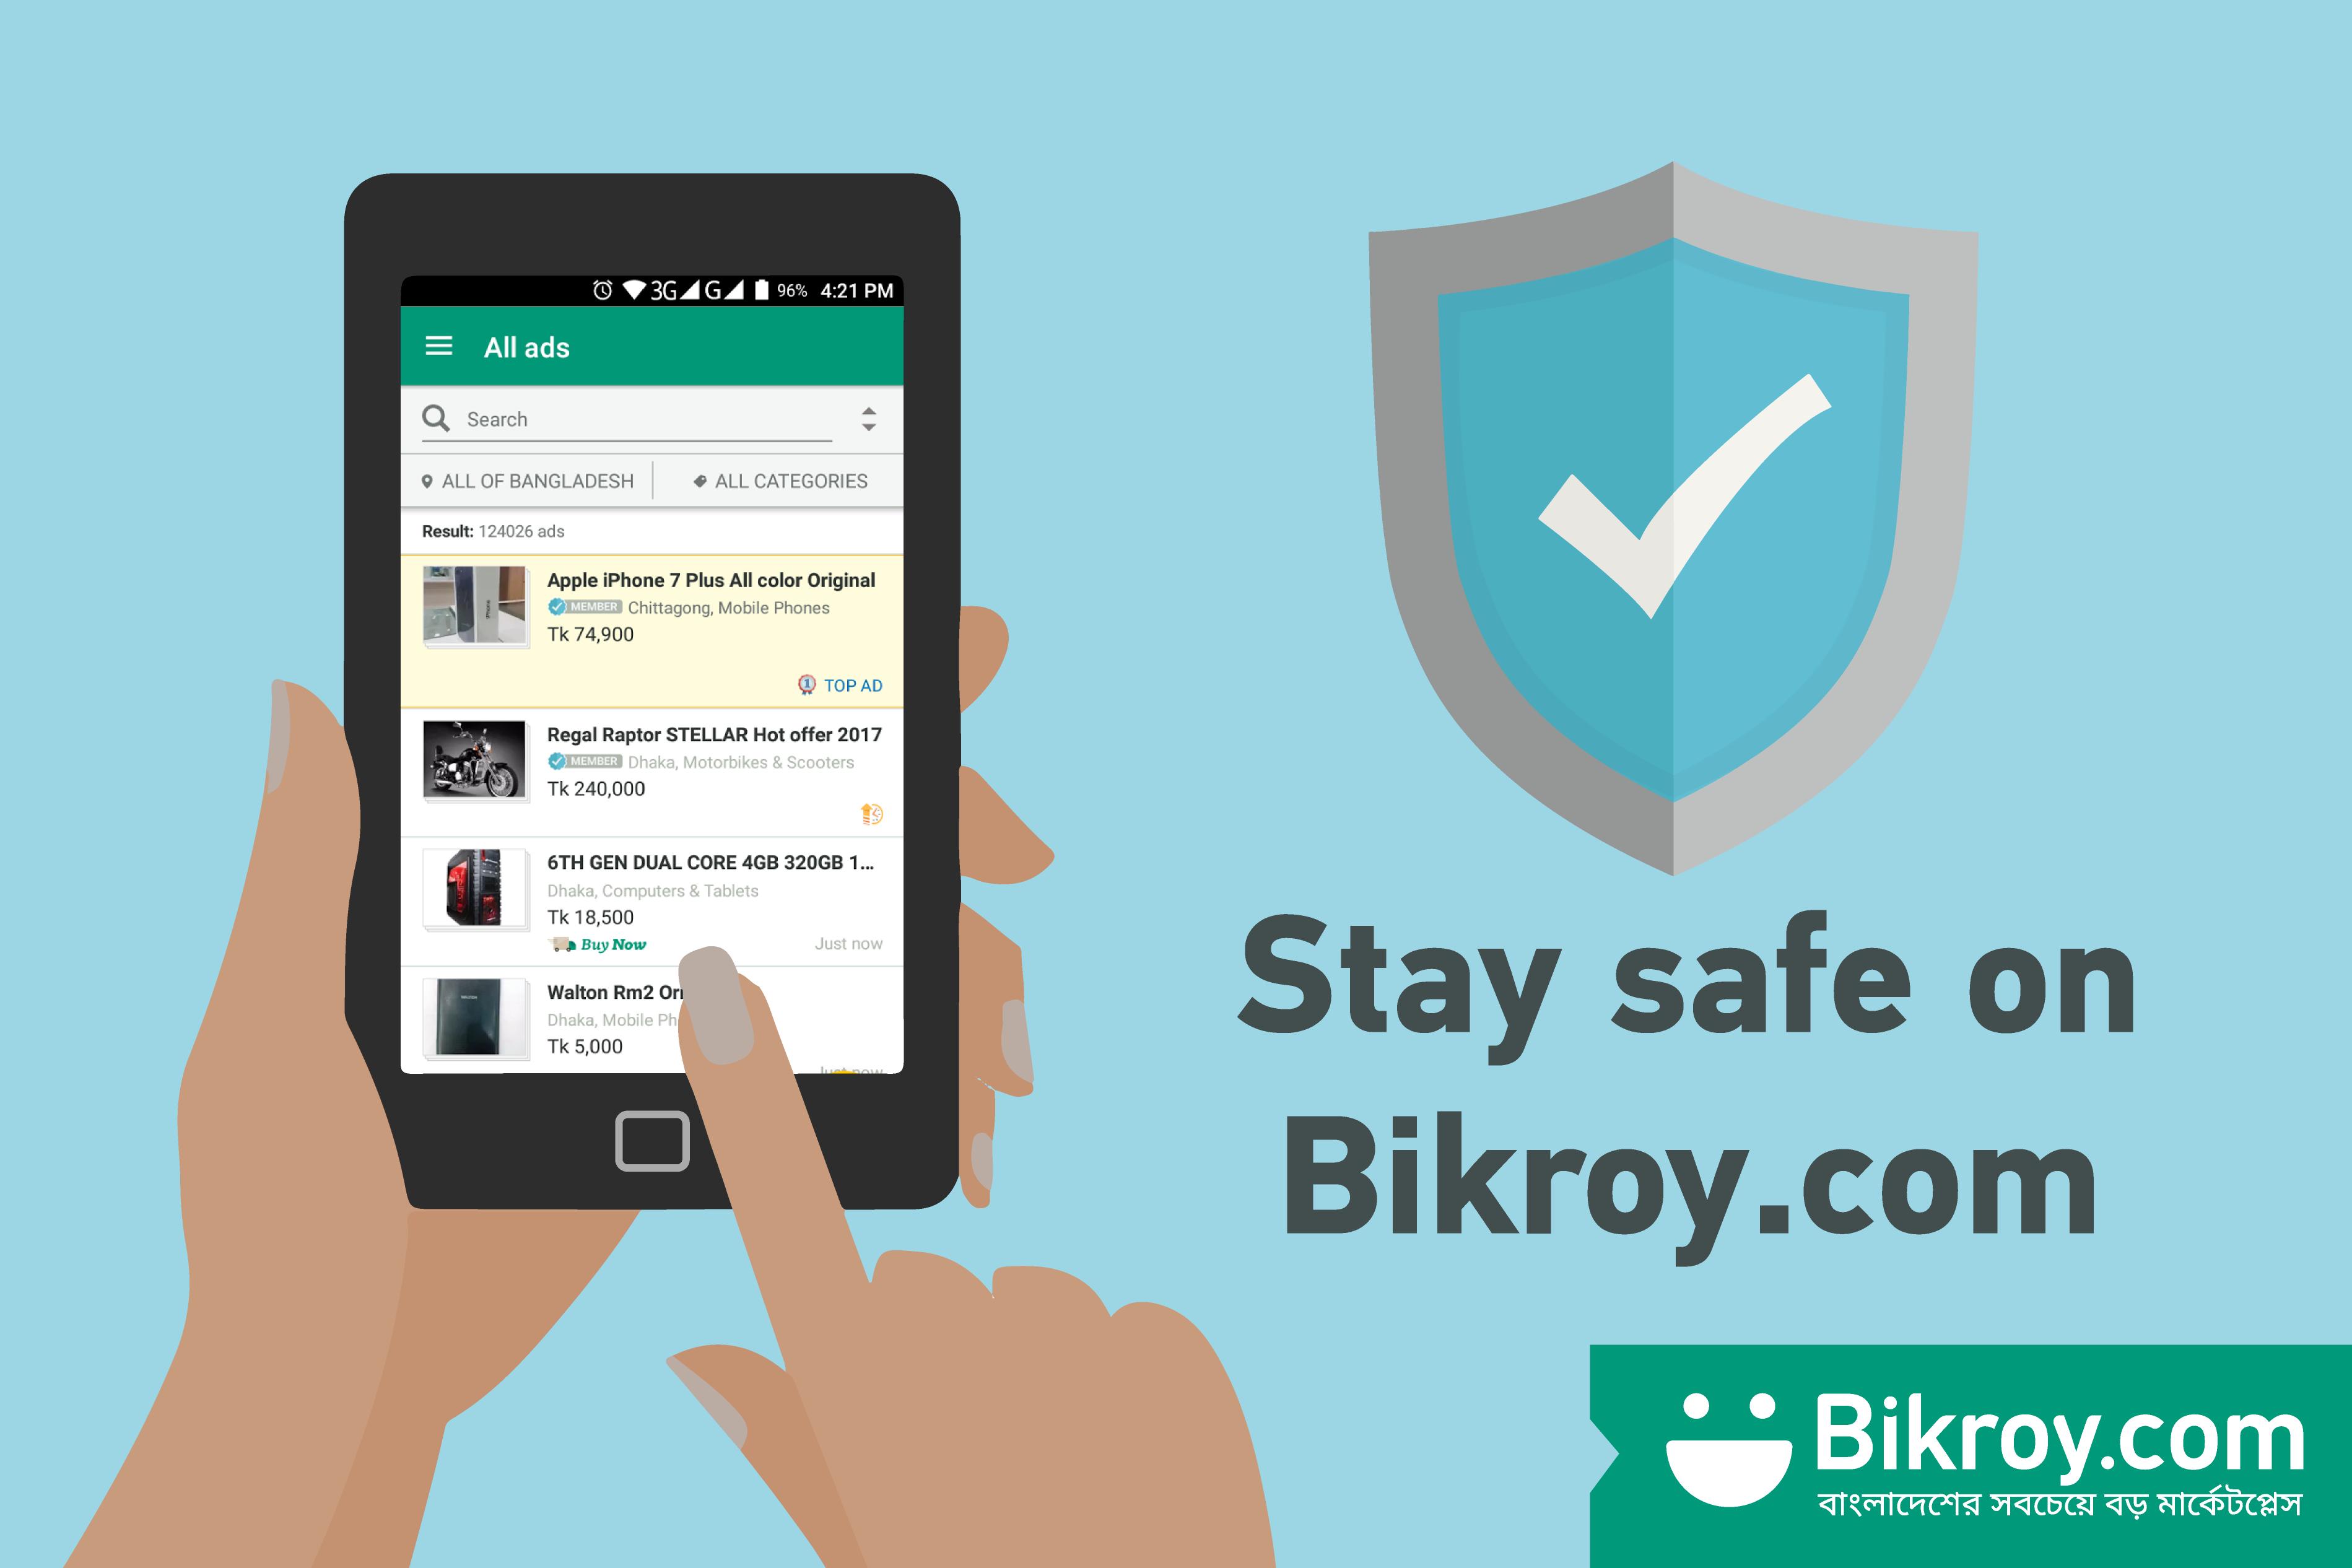 Bikroy Fraud Prevention PR-Image-3